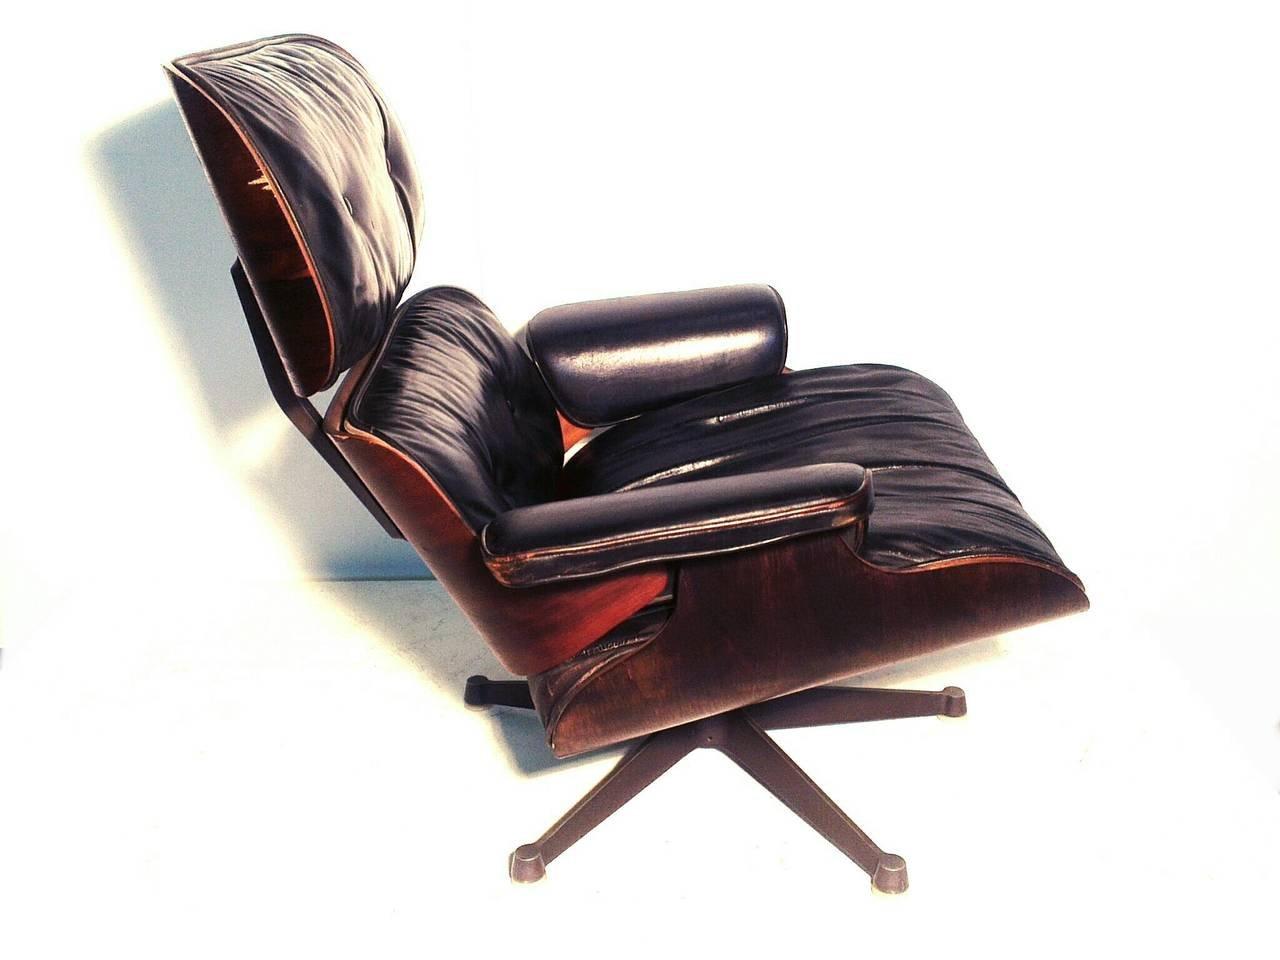 lounge stuhl von charles eames f r herman miller 1956 bei pamono kaufen. Black Bedroom Furniture Sets. Home Design Ideas